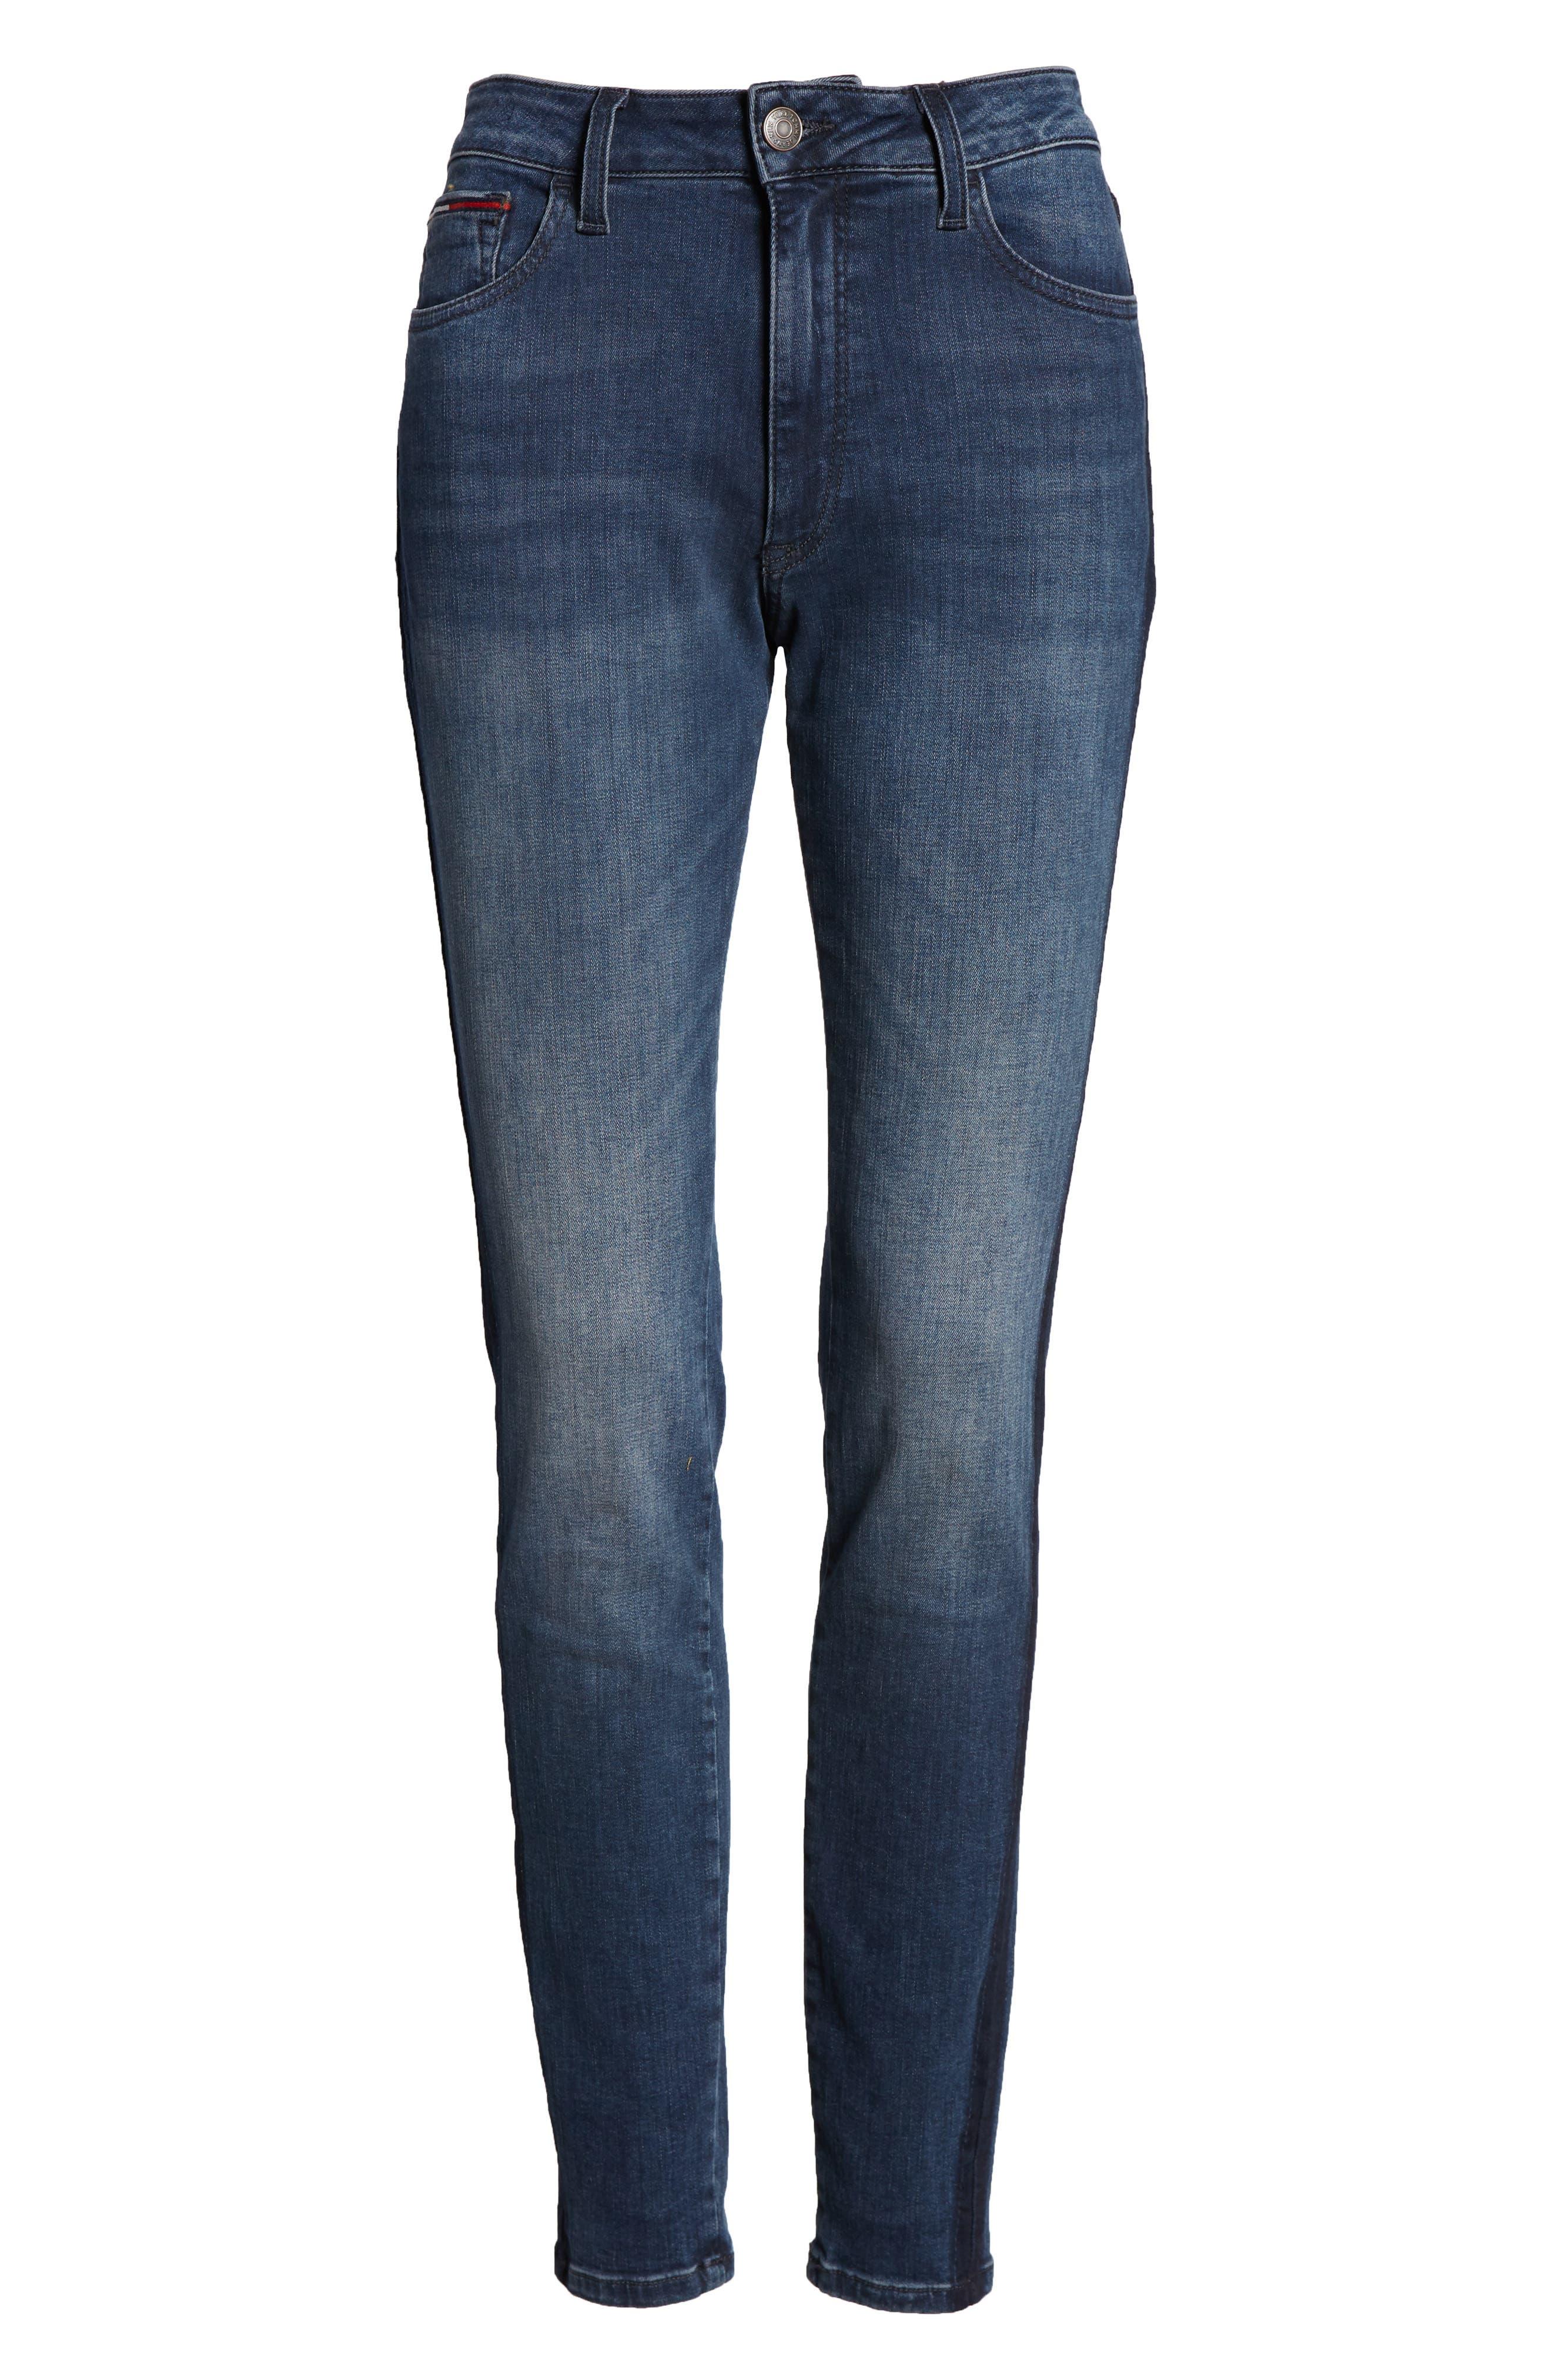 Santana High Waist Skinny Jeans,                             Alternate thumbnail 7, color,                             NEDDLE DARK BLUE STRETCH